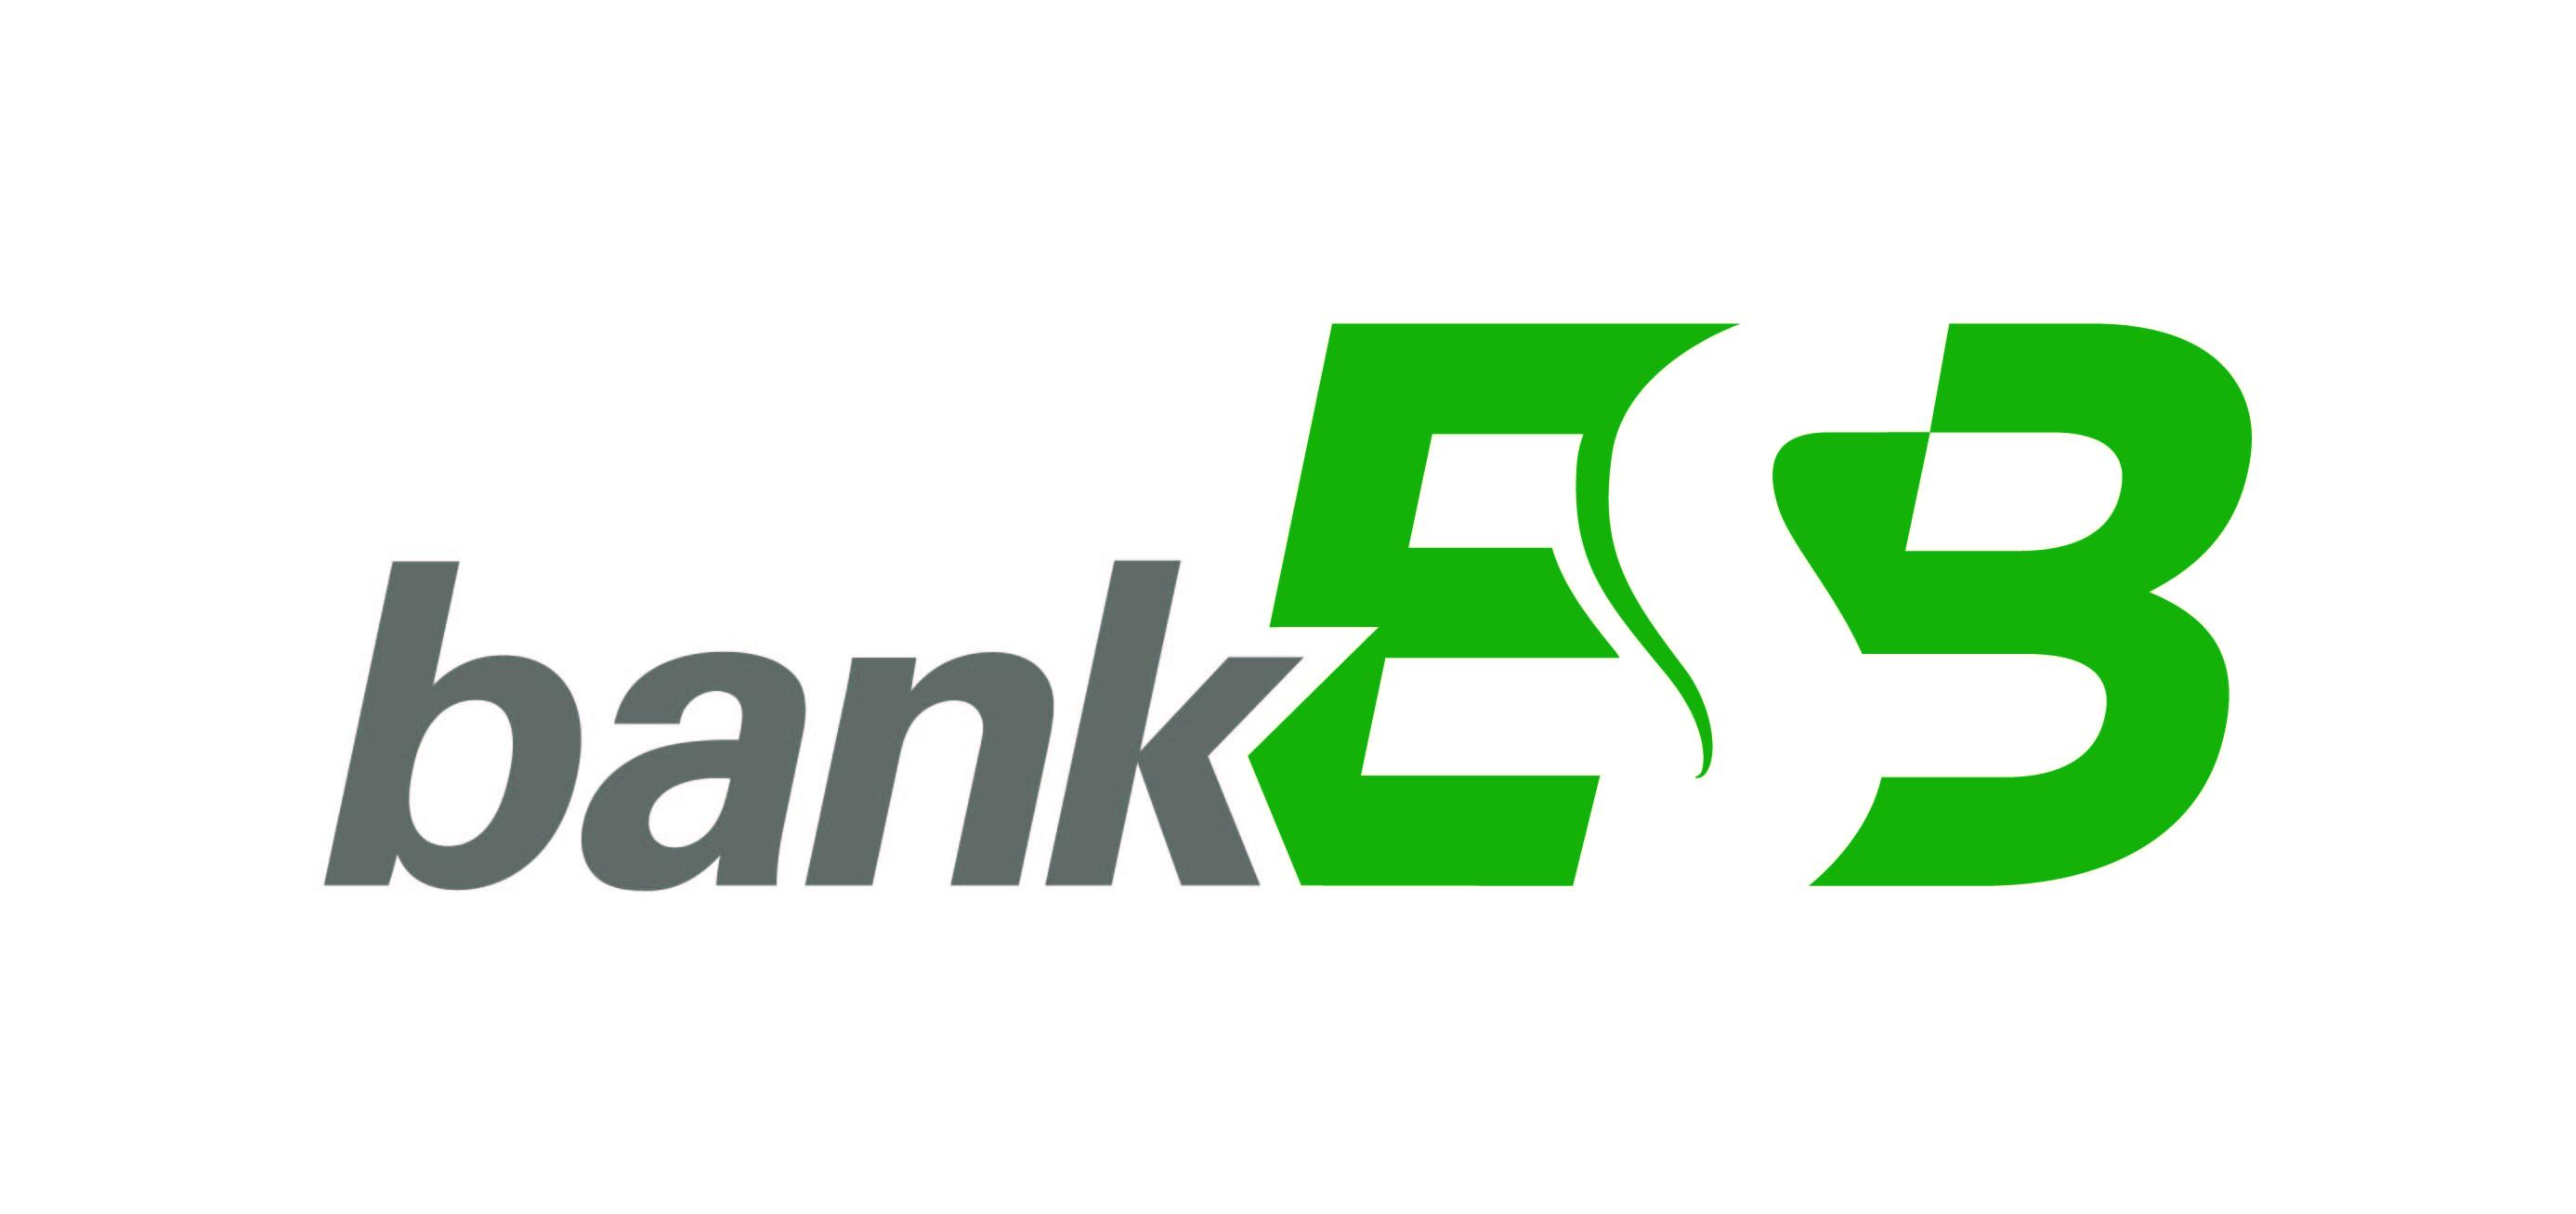 ESB_Logo_2CSpot_F.JPG